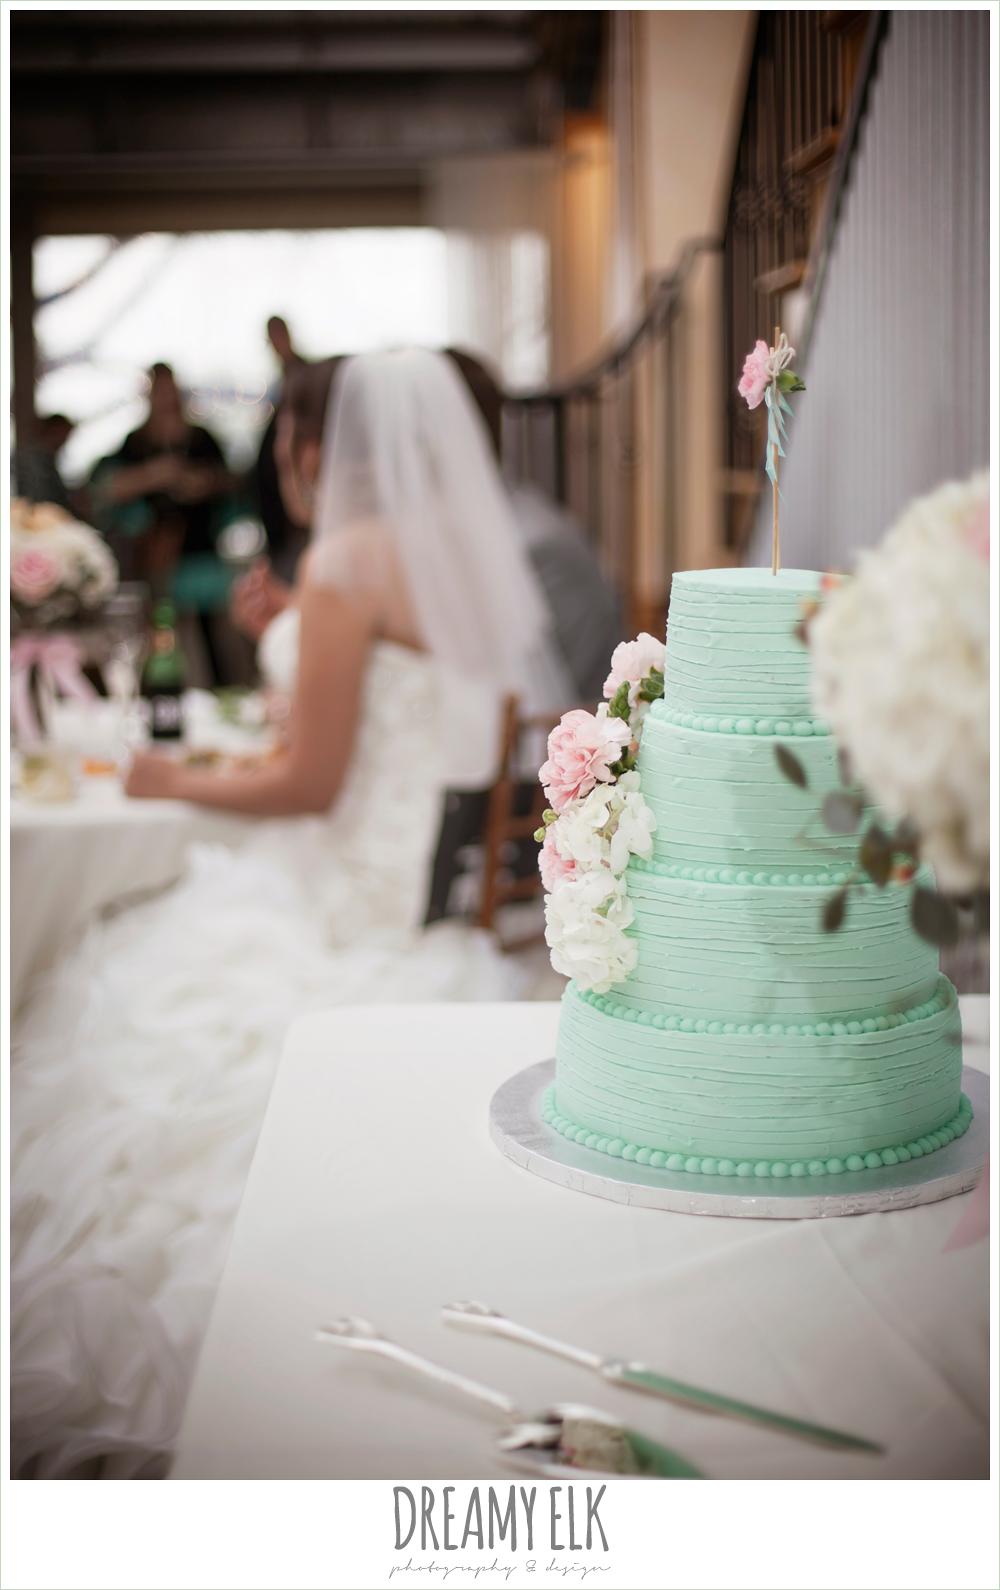 mint green wedding cake, sheila's sweet shoppe, terradorna wedding venue, austin spring wedding {dreamy elk photography and design}